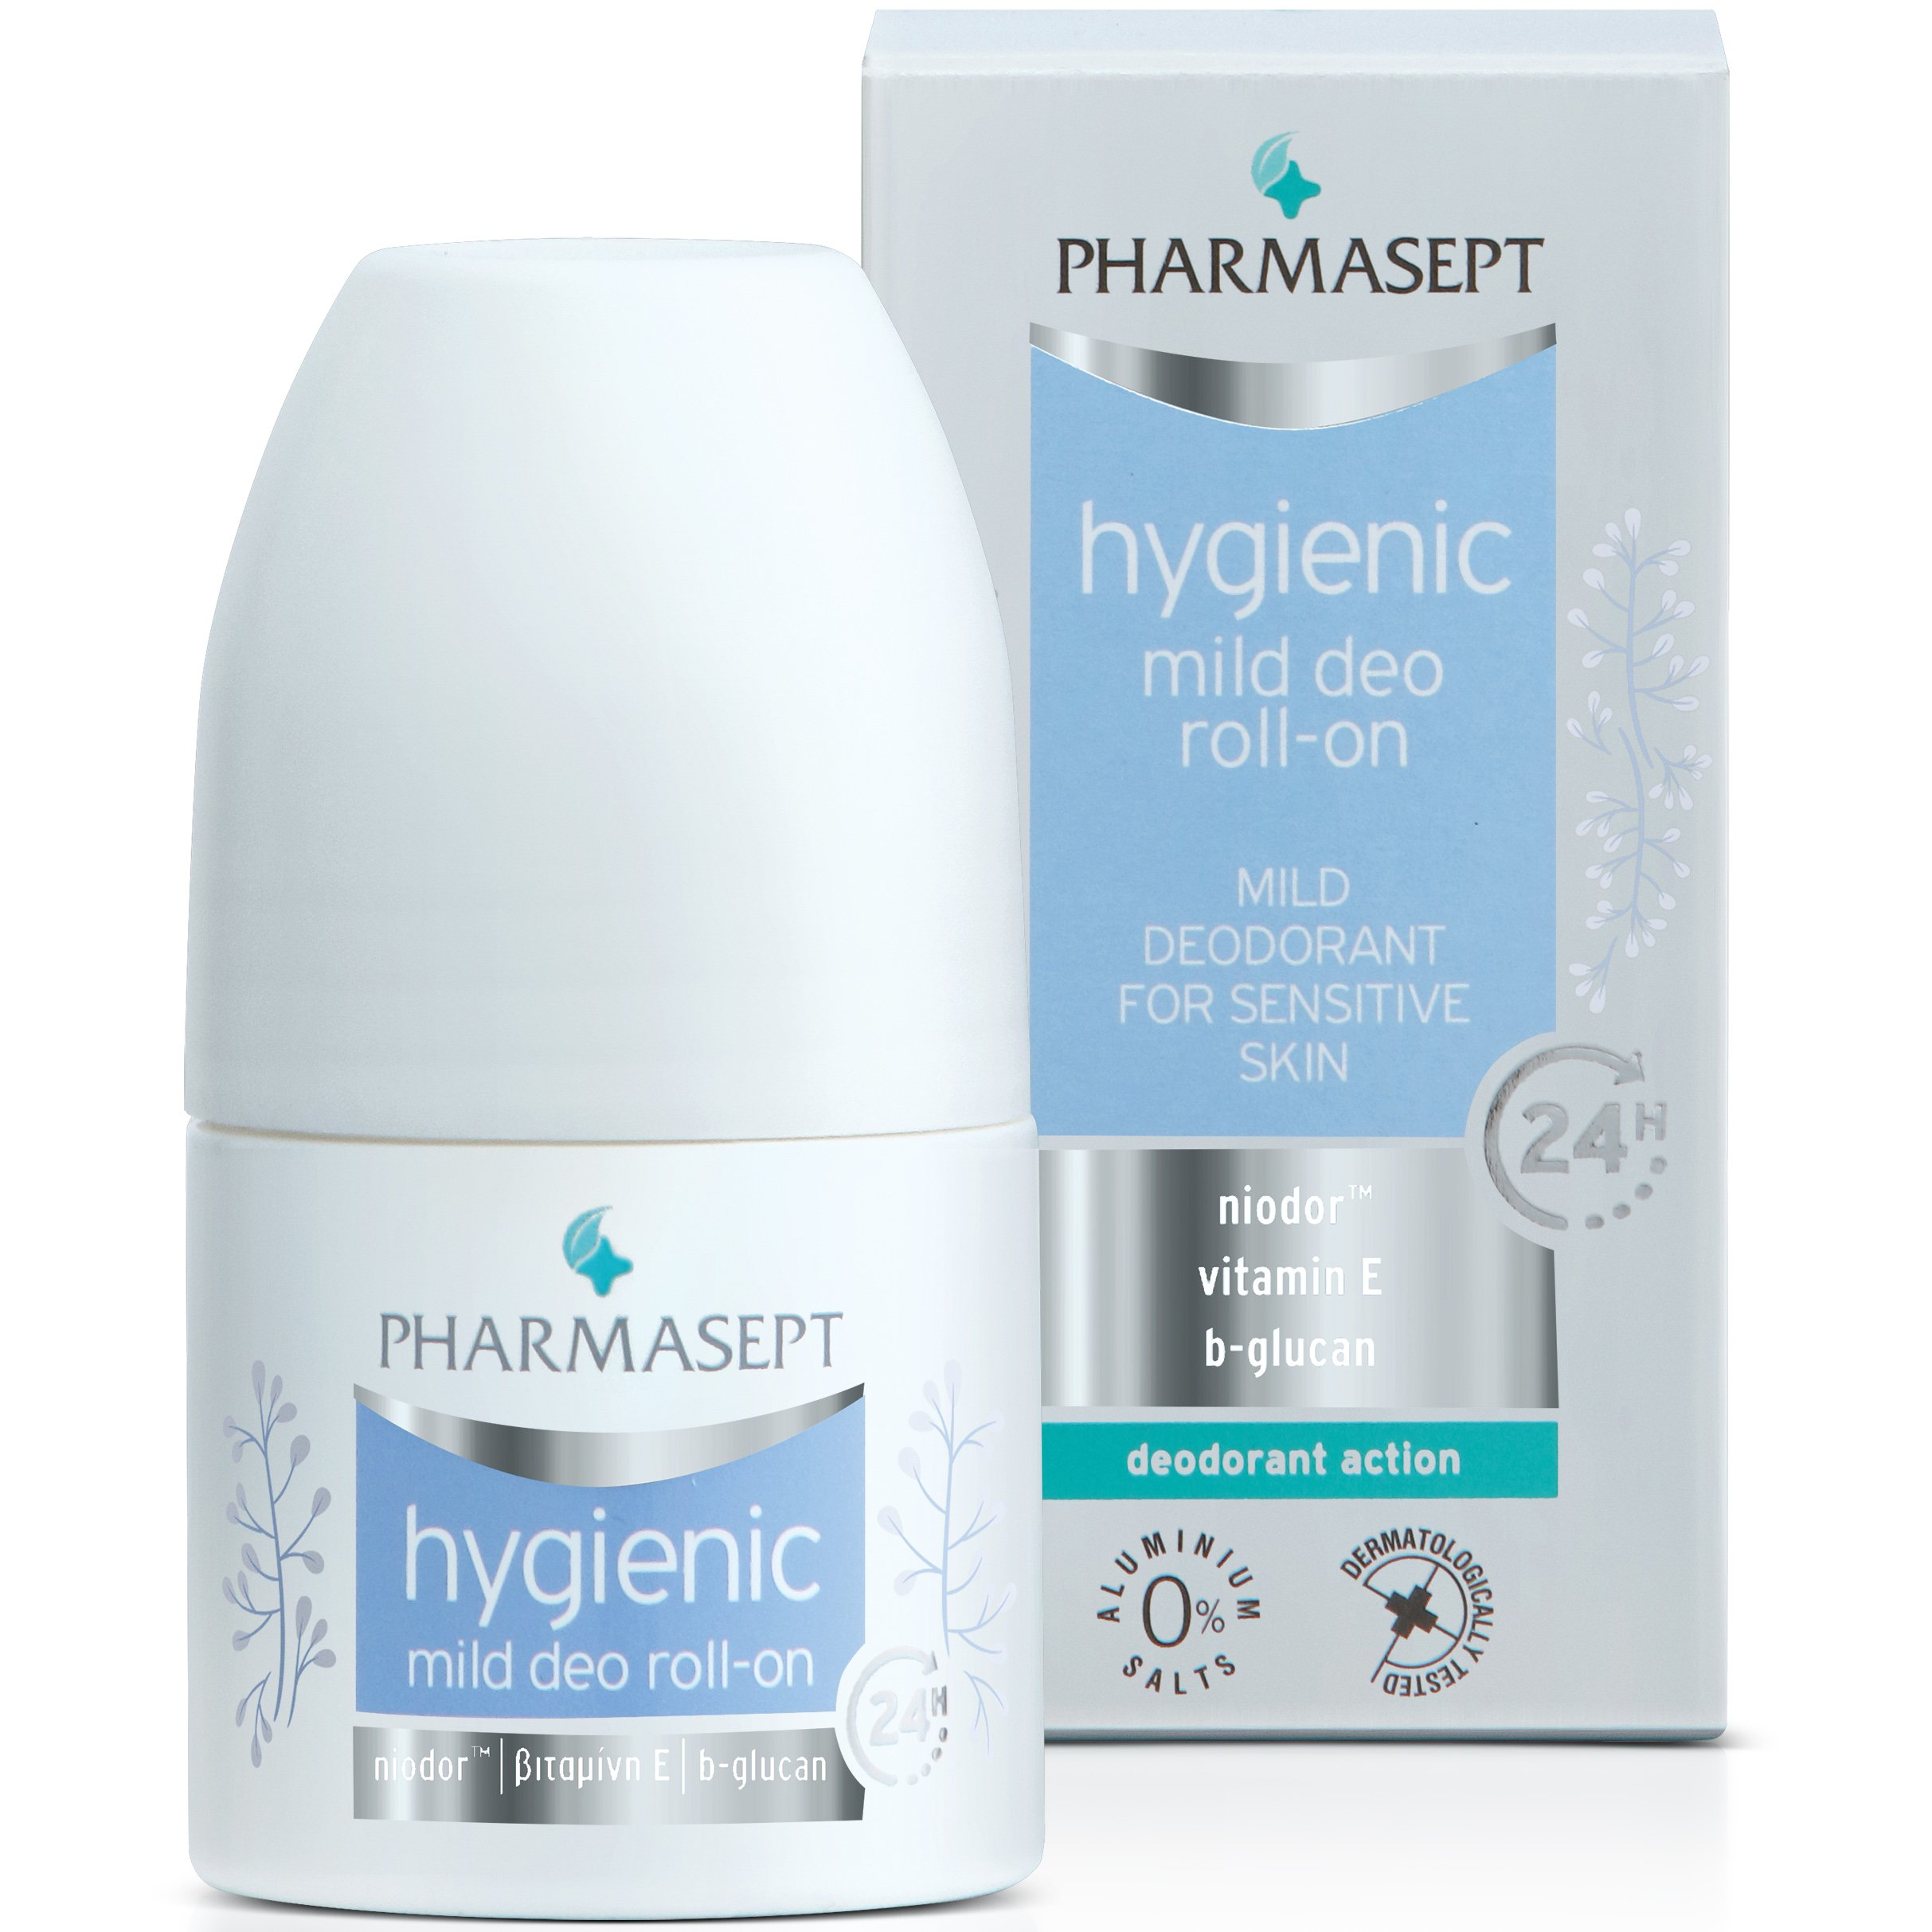 Pharmasept Hygienic Mild Deo 24h Roll-On Απαλό Αποσμητικό για Ευαίσθητες Επιδερμίδες 50ml